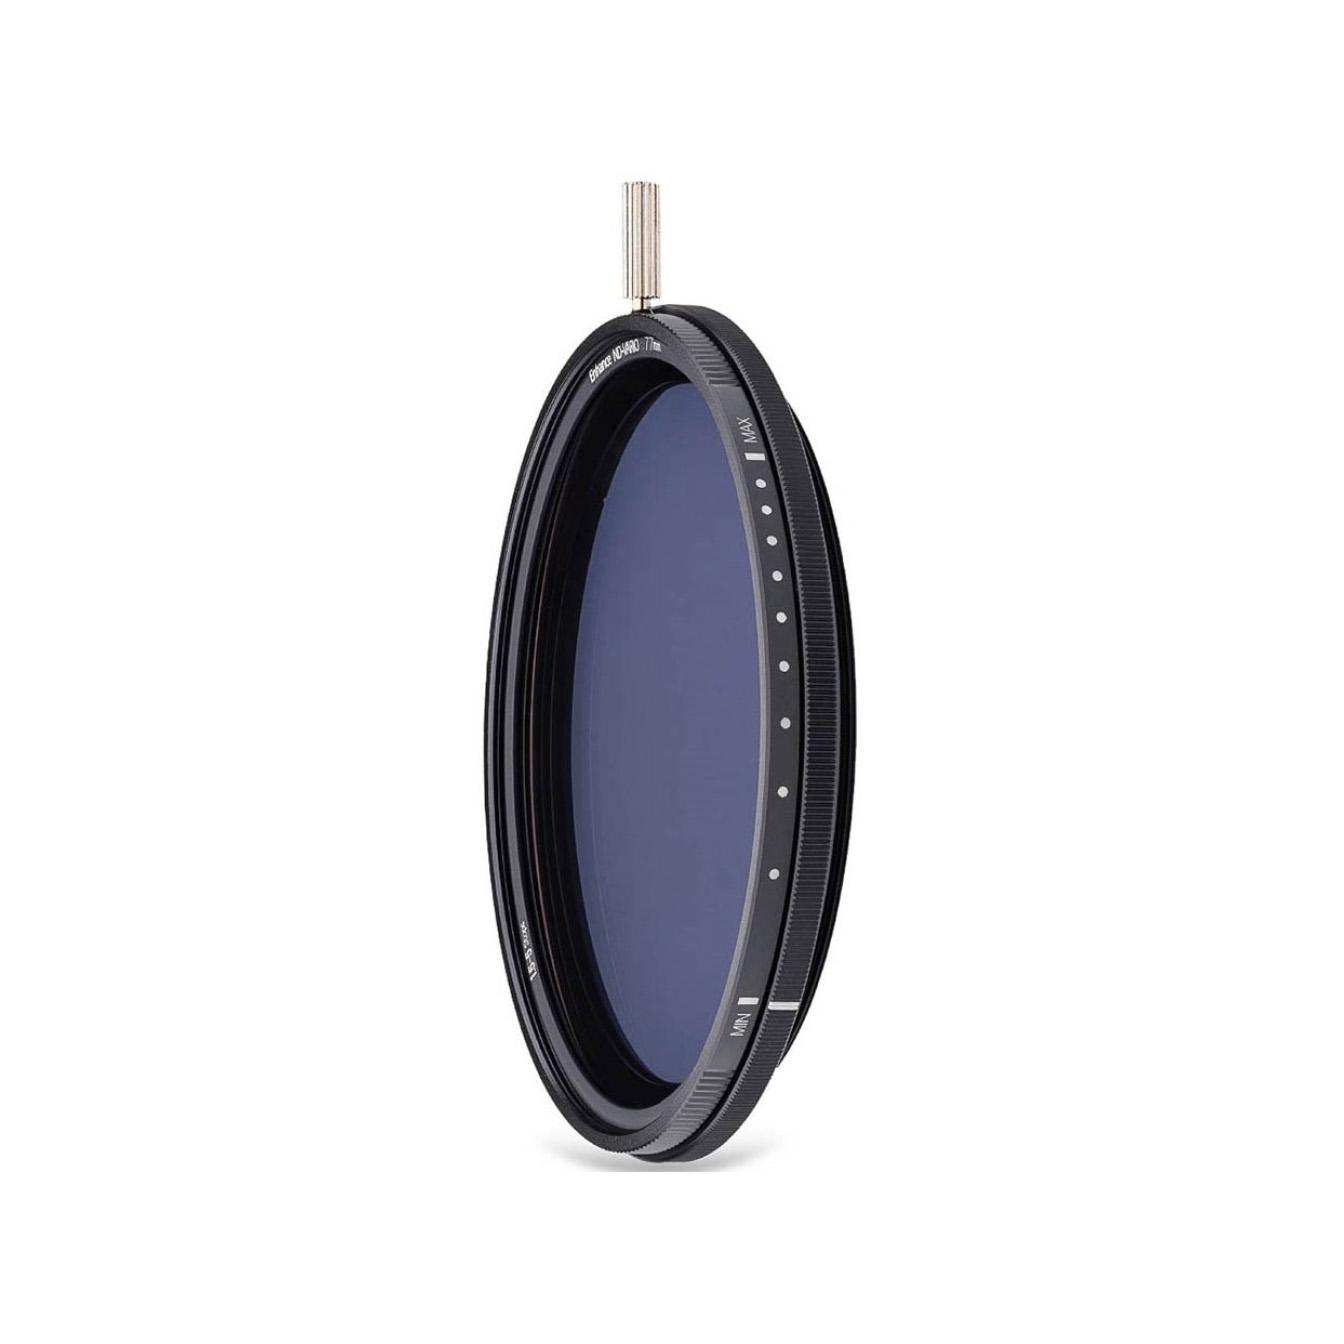 فیلتر ND متغیر NiSi Pro Nano 1.5-5 Stop Enhance ND-VARIO 72mm